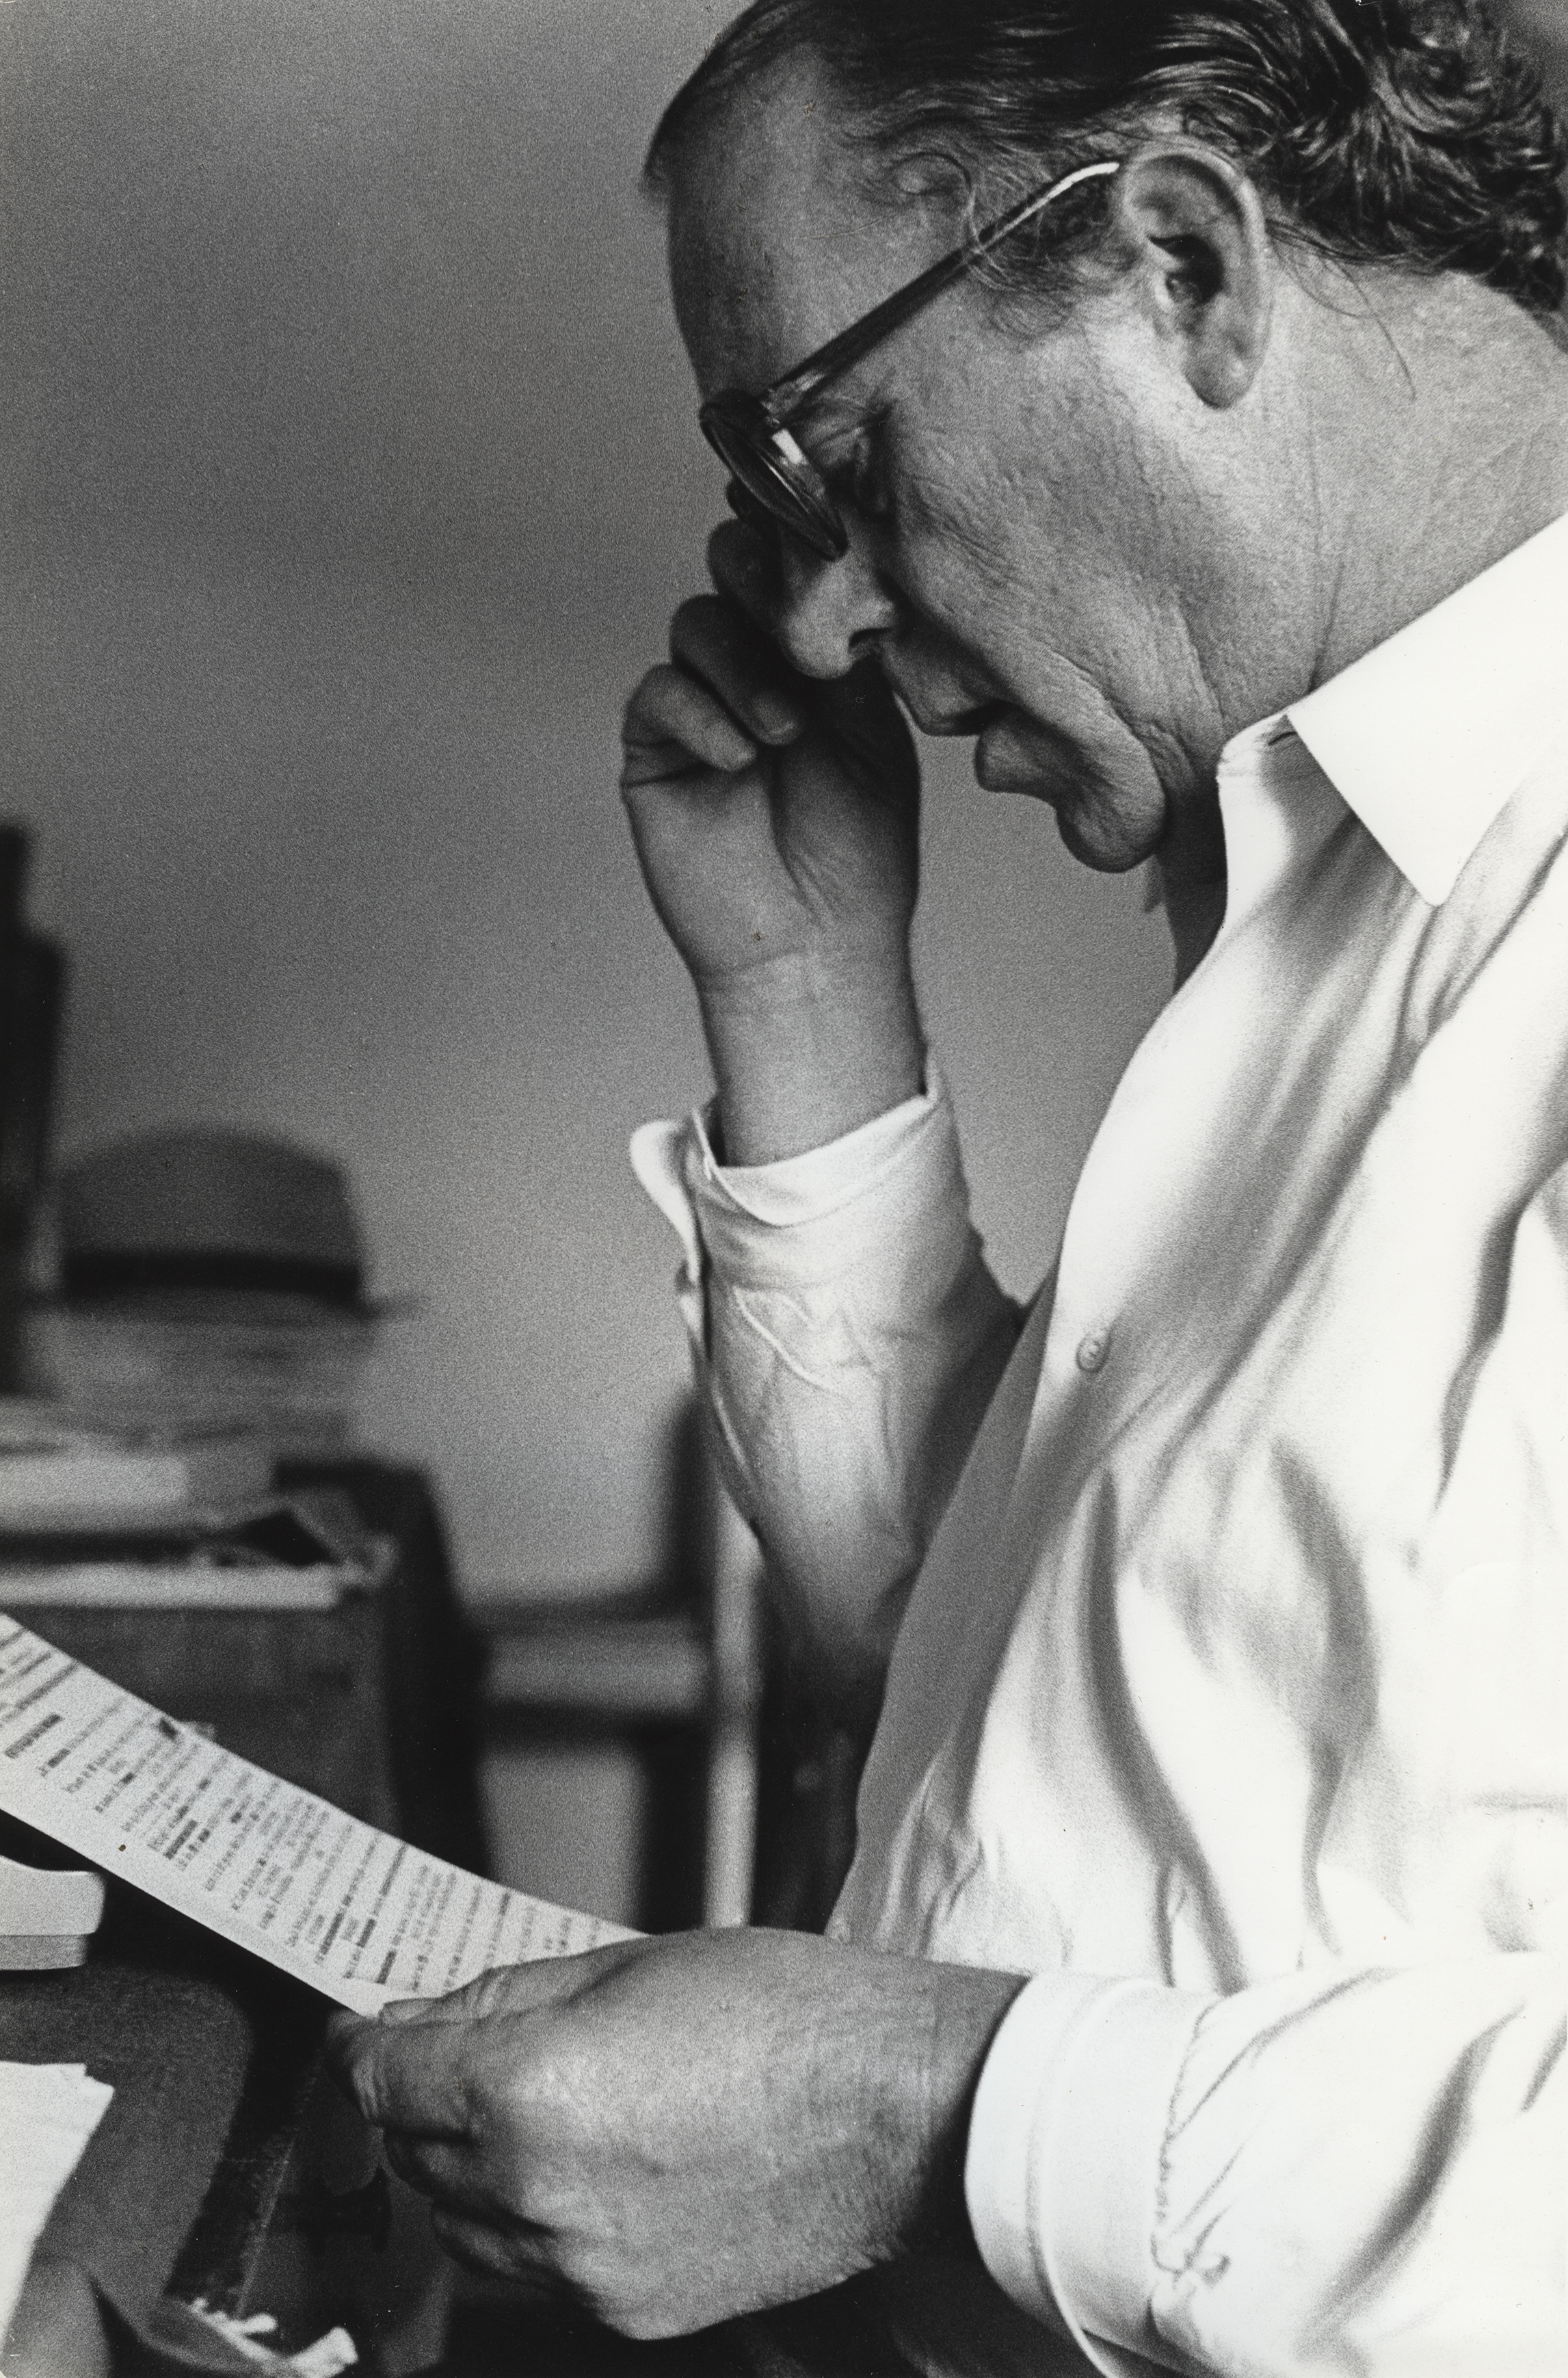 Heinz Held, Heinrich Böll mit Manuskript,1953. © Museum Ludwig, Köln